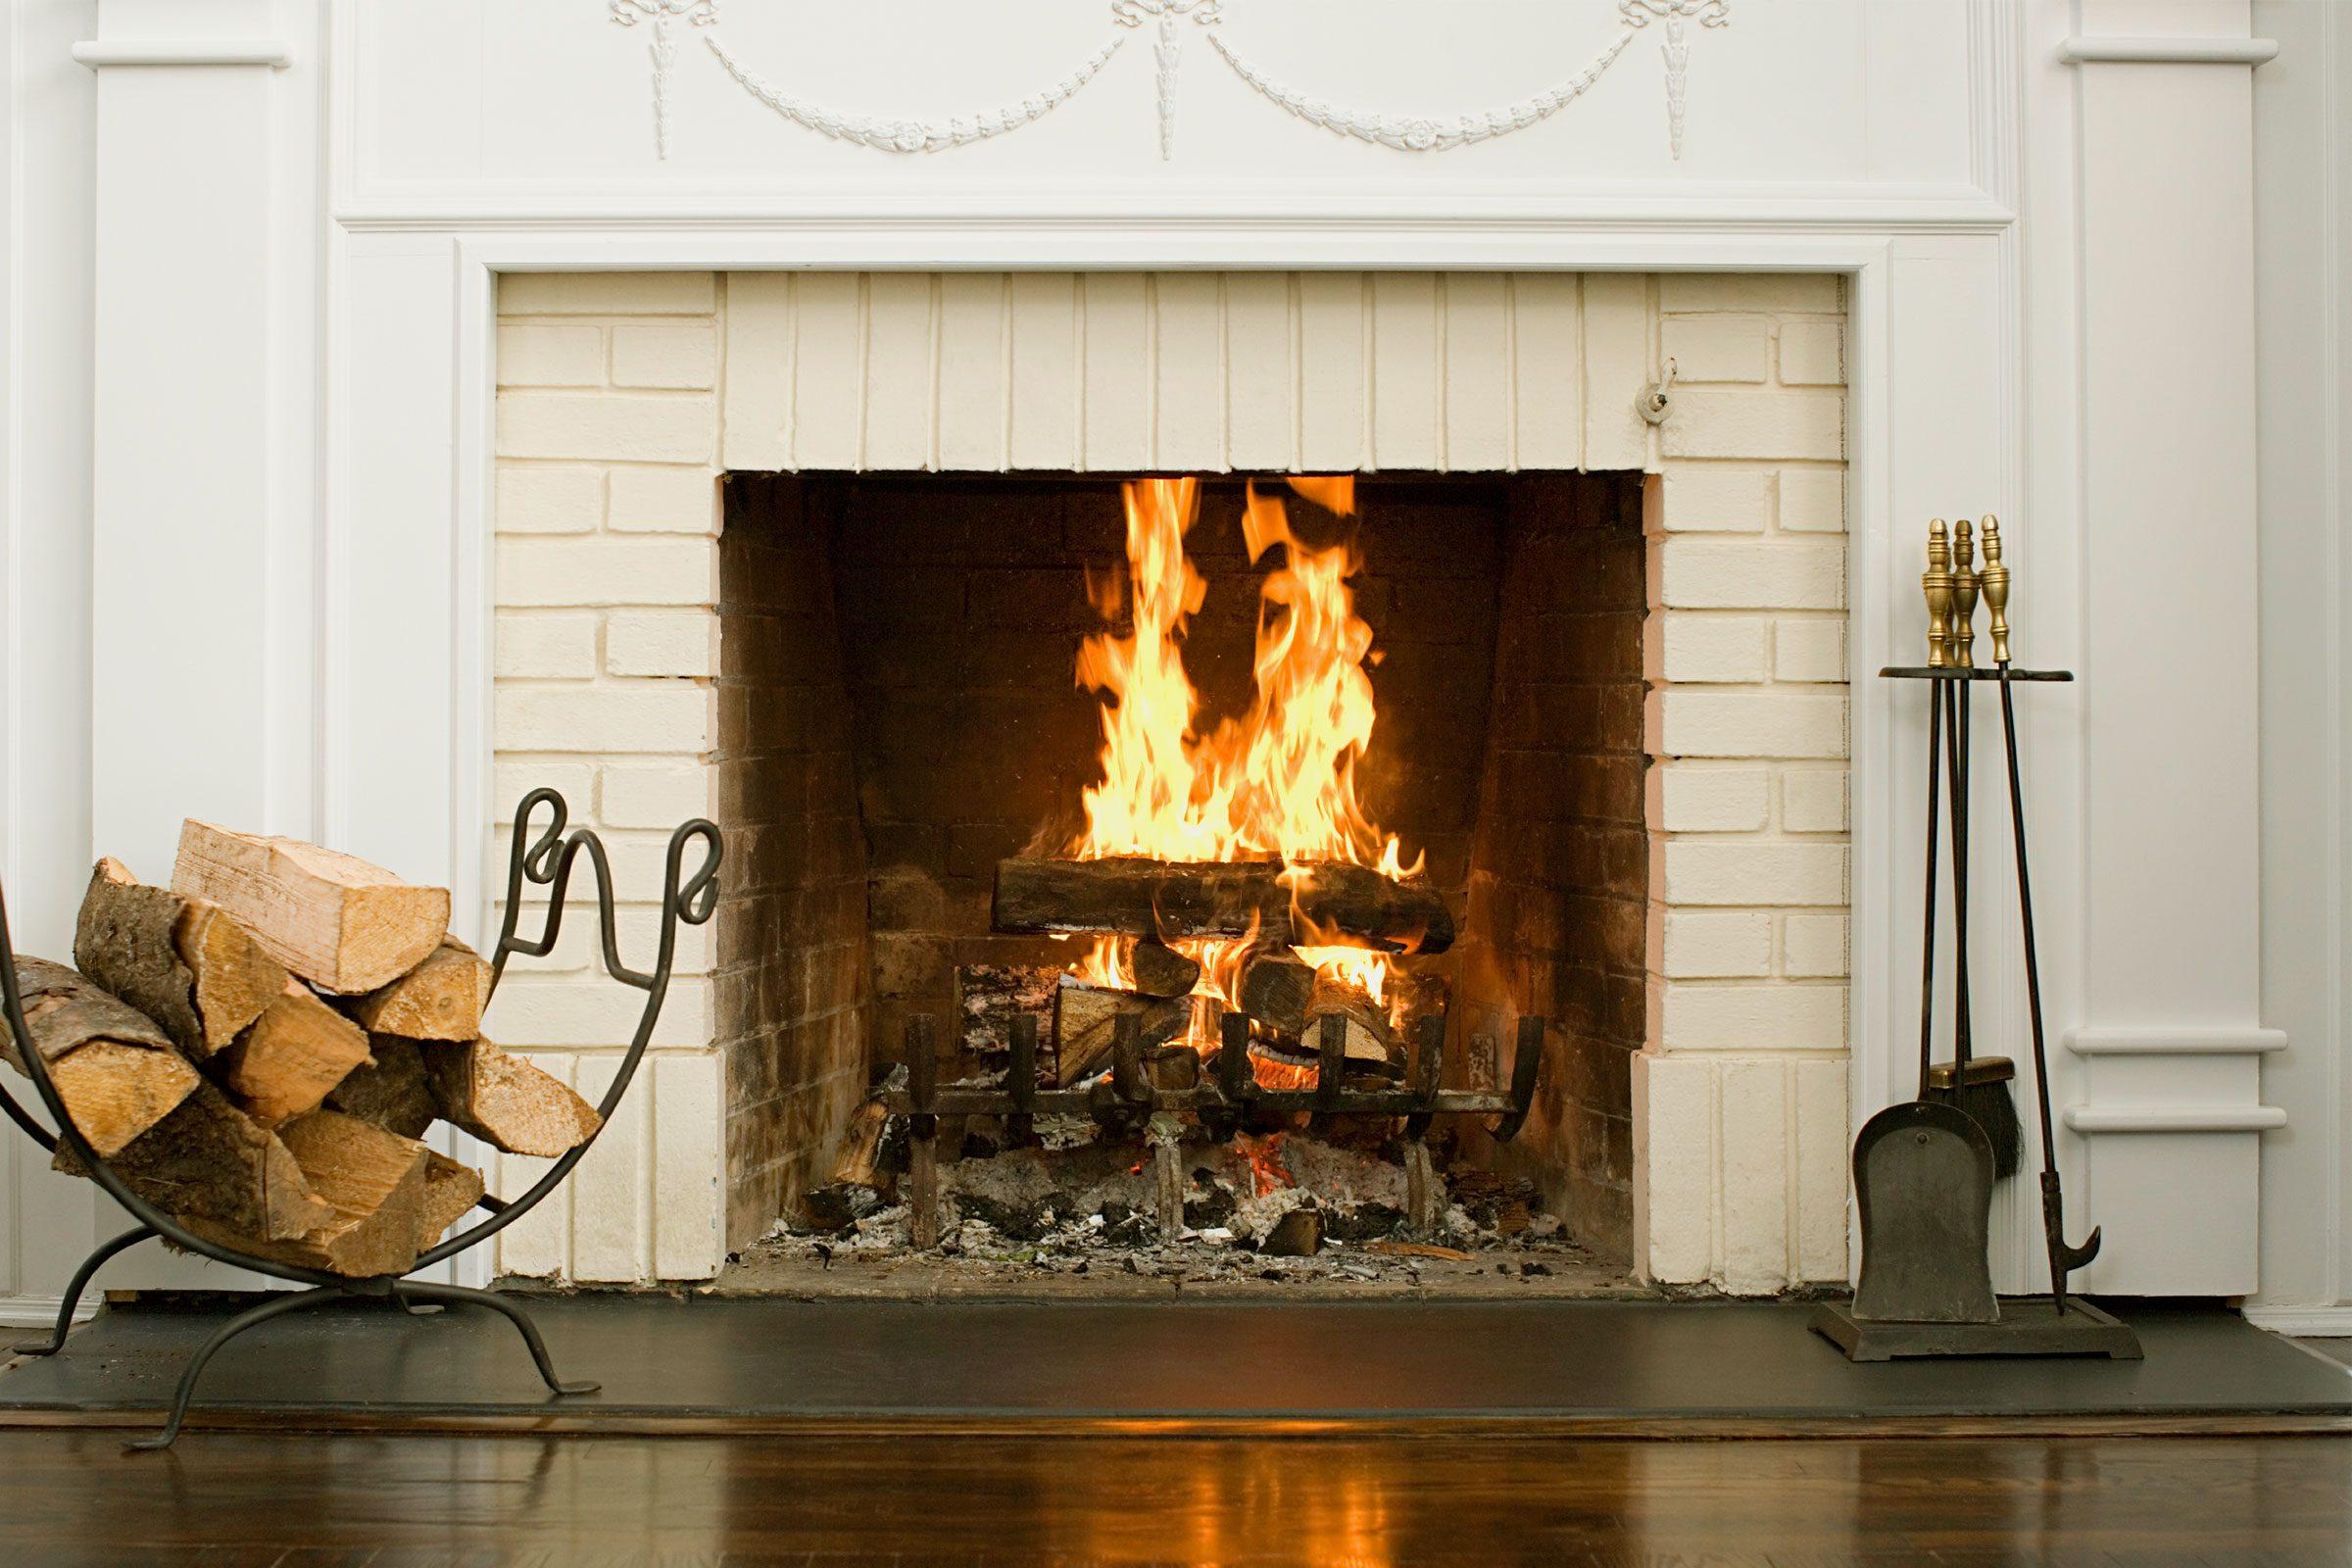 06-34-reasons-to-load-up-on-lemons-fireplace